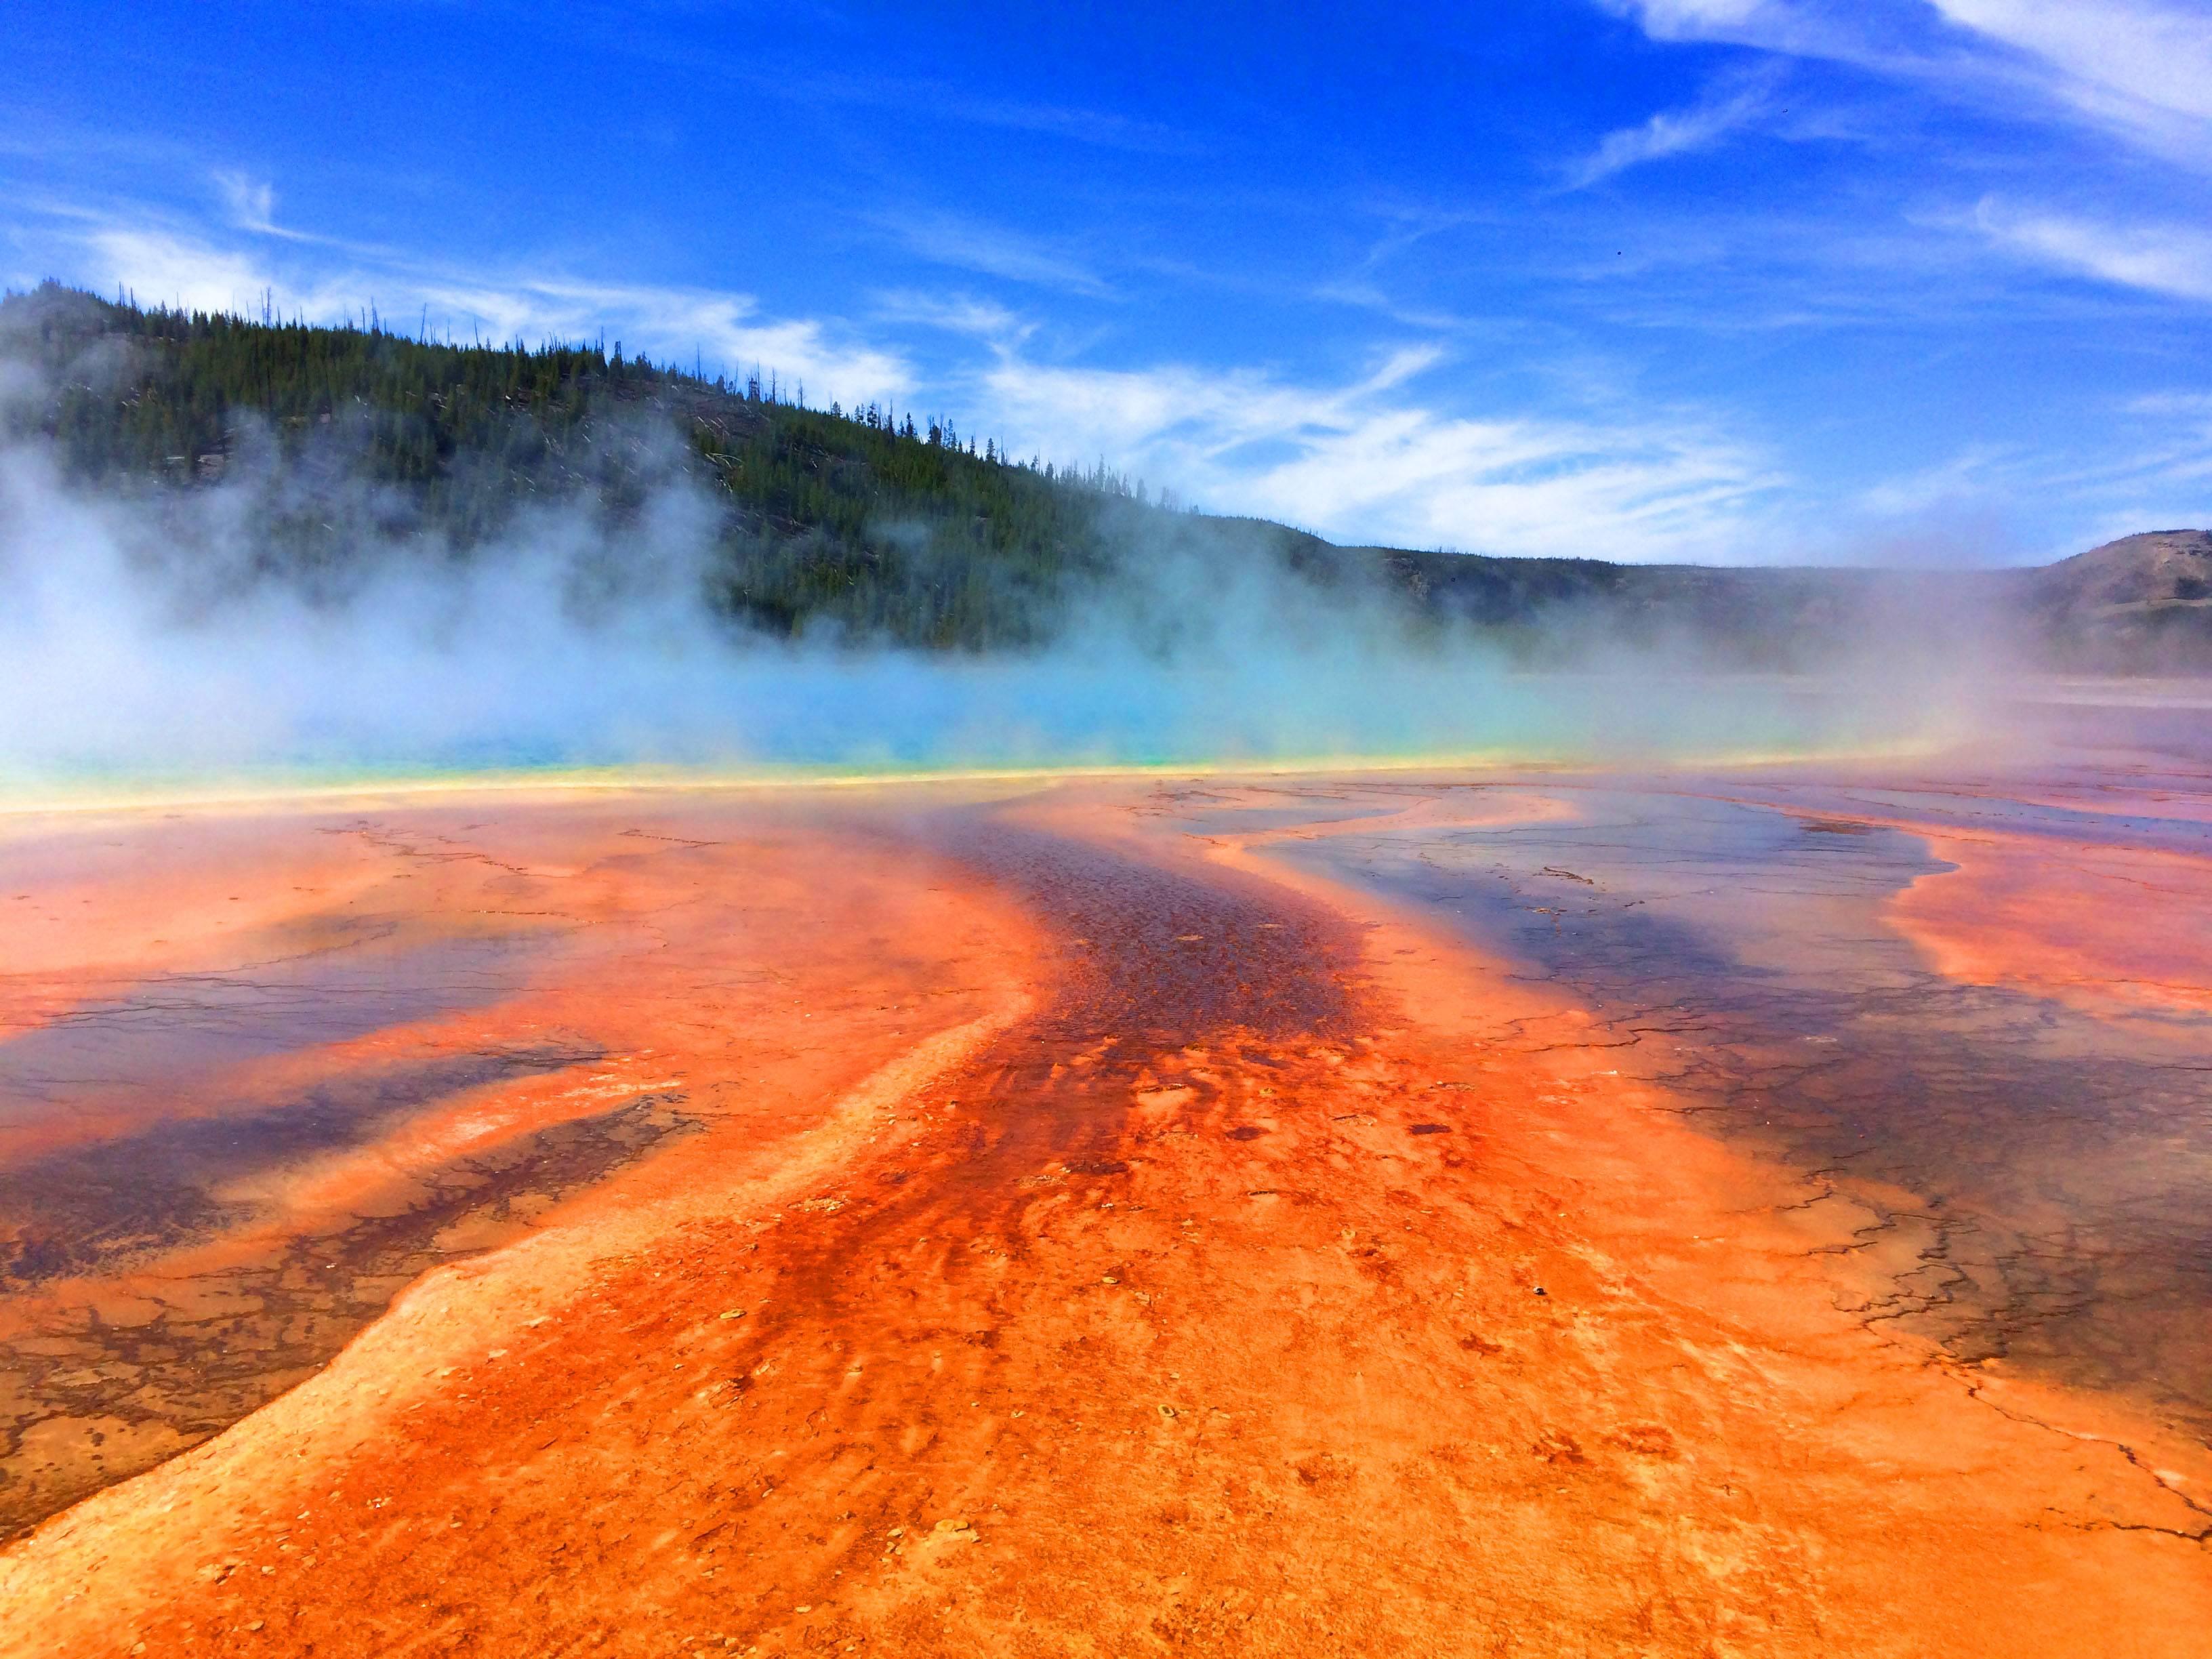 Photo 2: Yellowstone National Parc